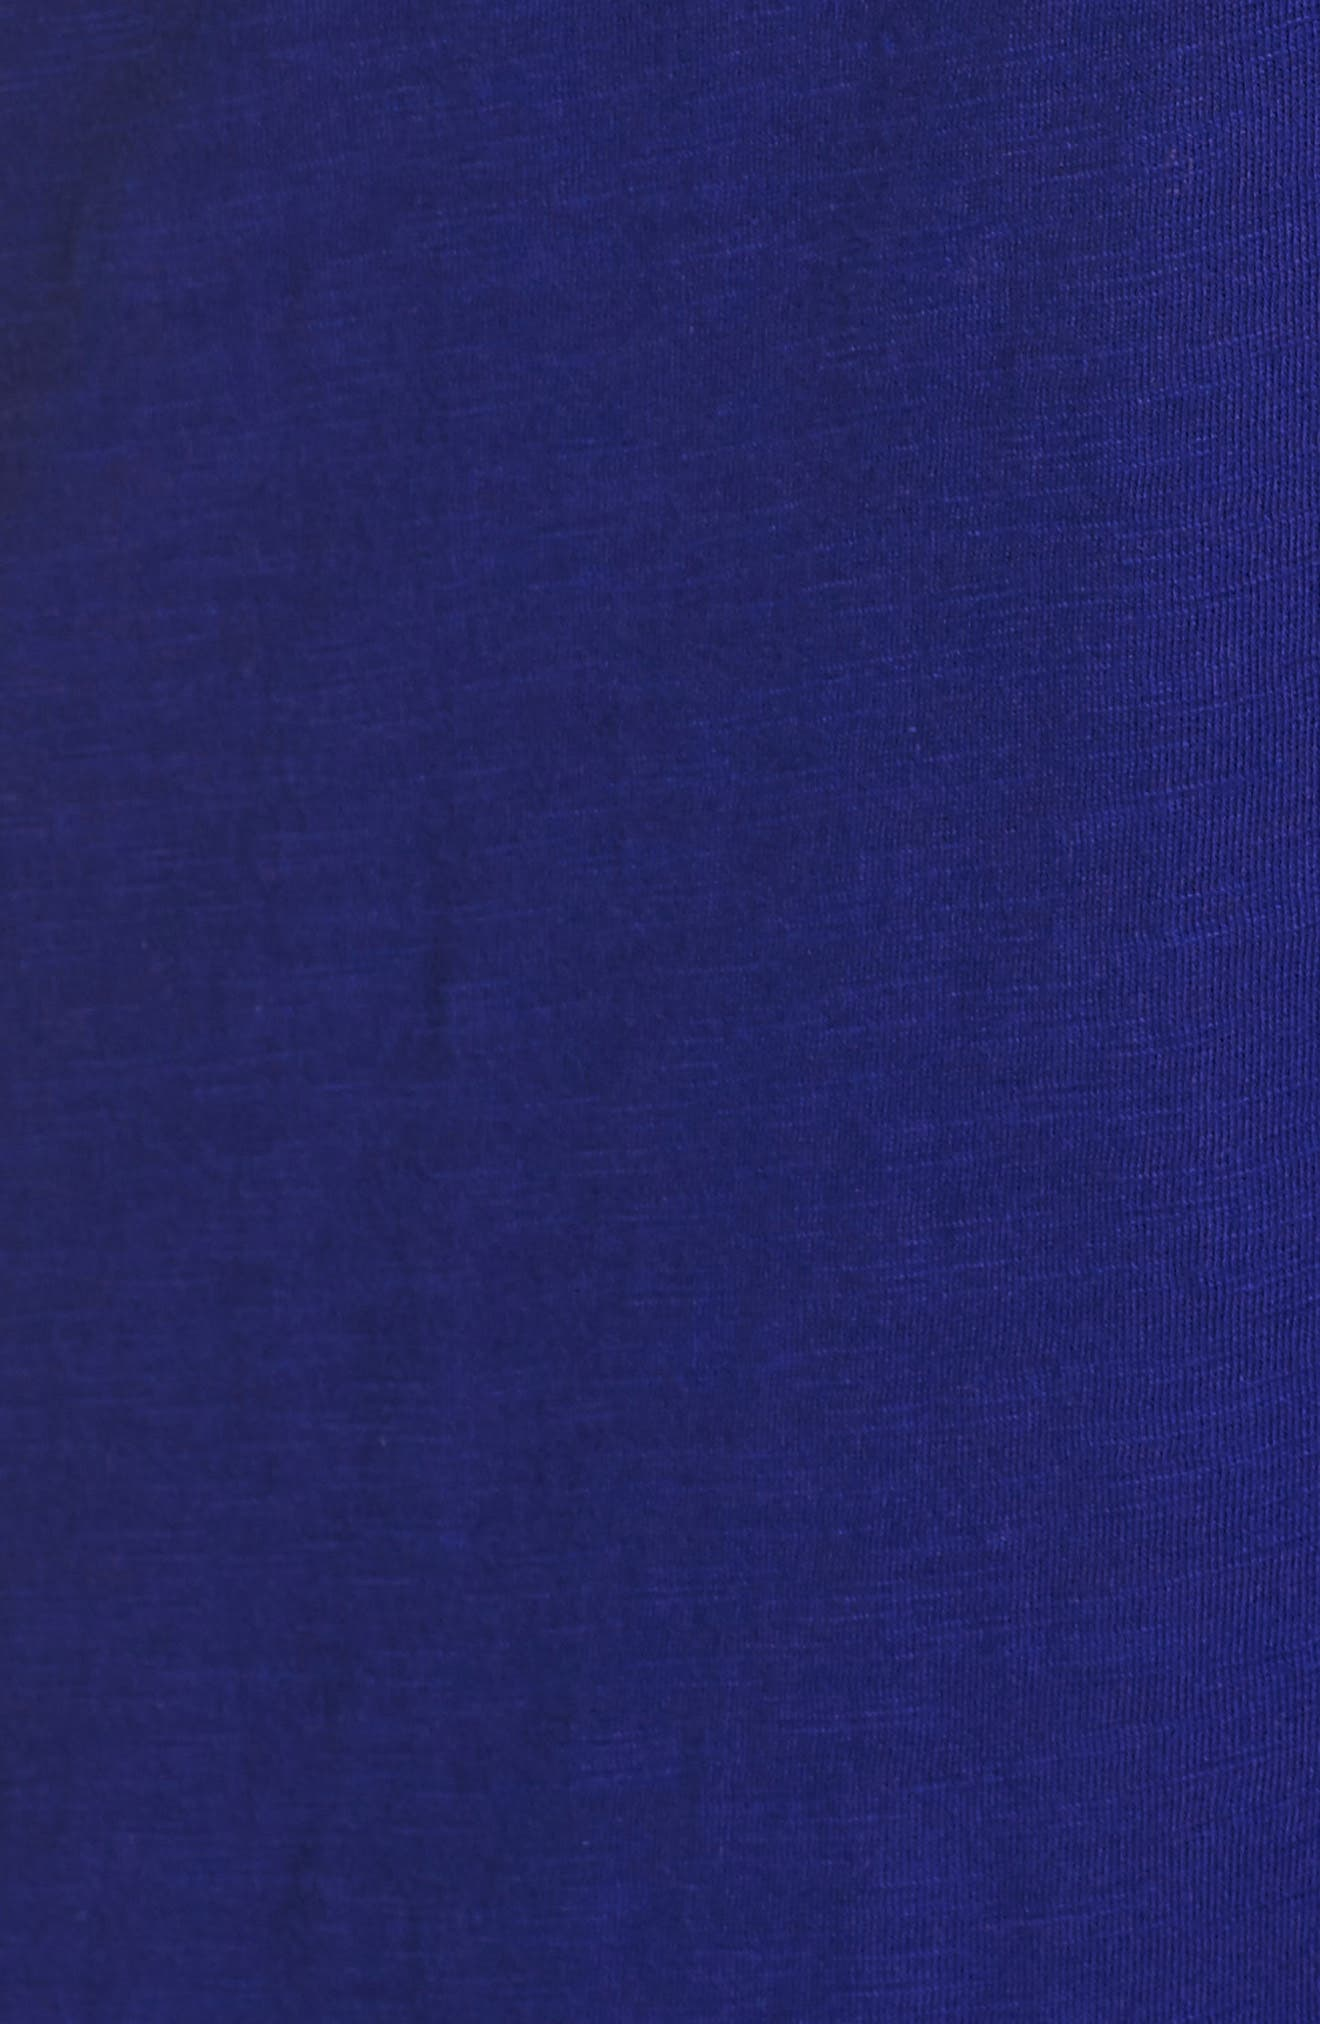 Essie Shift Dress,                             Alternate thumbnail 6, color,                             Twilight Blue